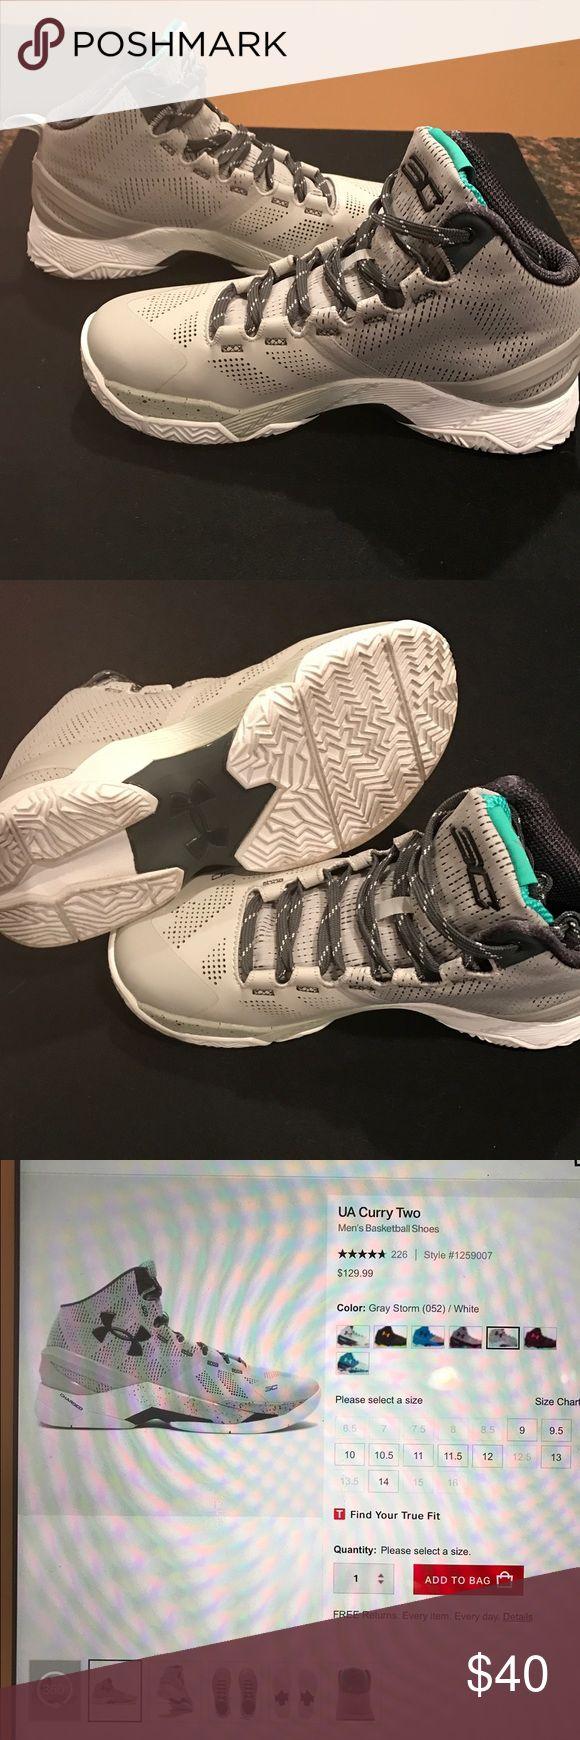 Under Armor basketball shoes UA Curry 2 - men's basketball shoes Under Armour Shoes Athletic Shoes